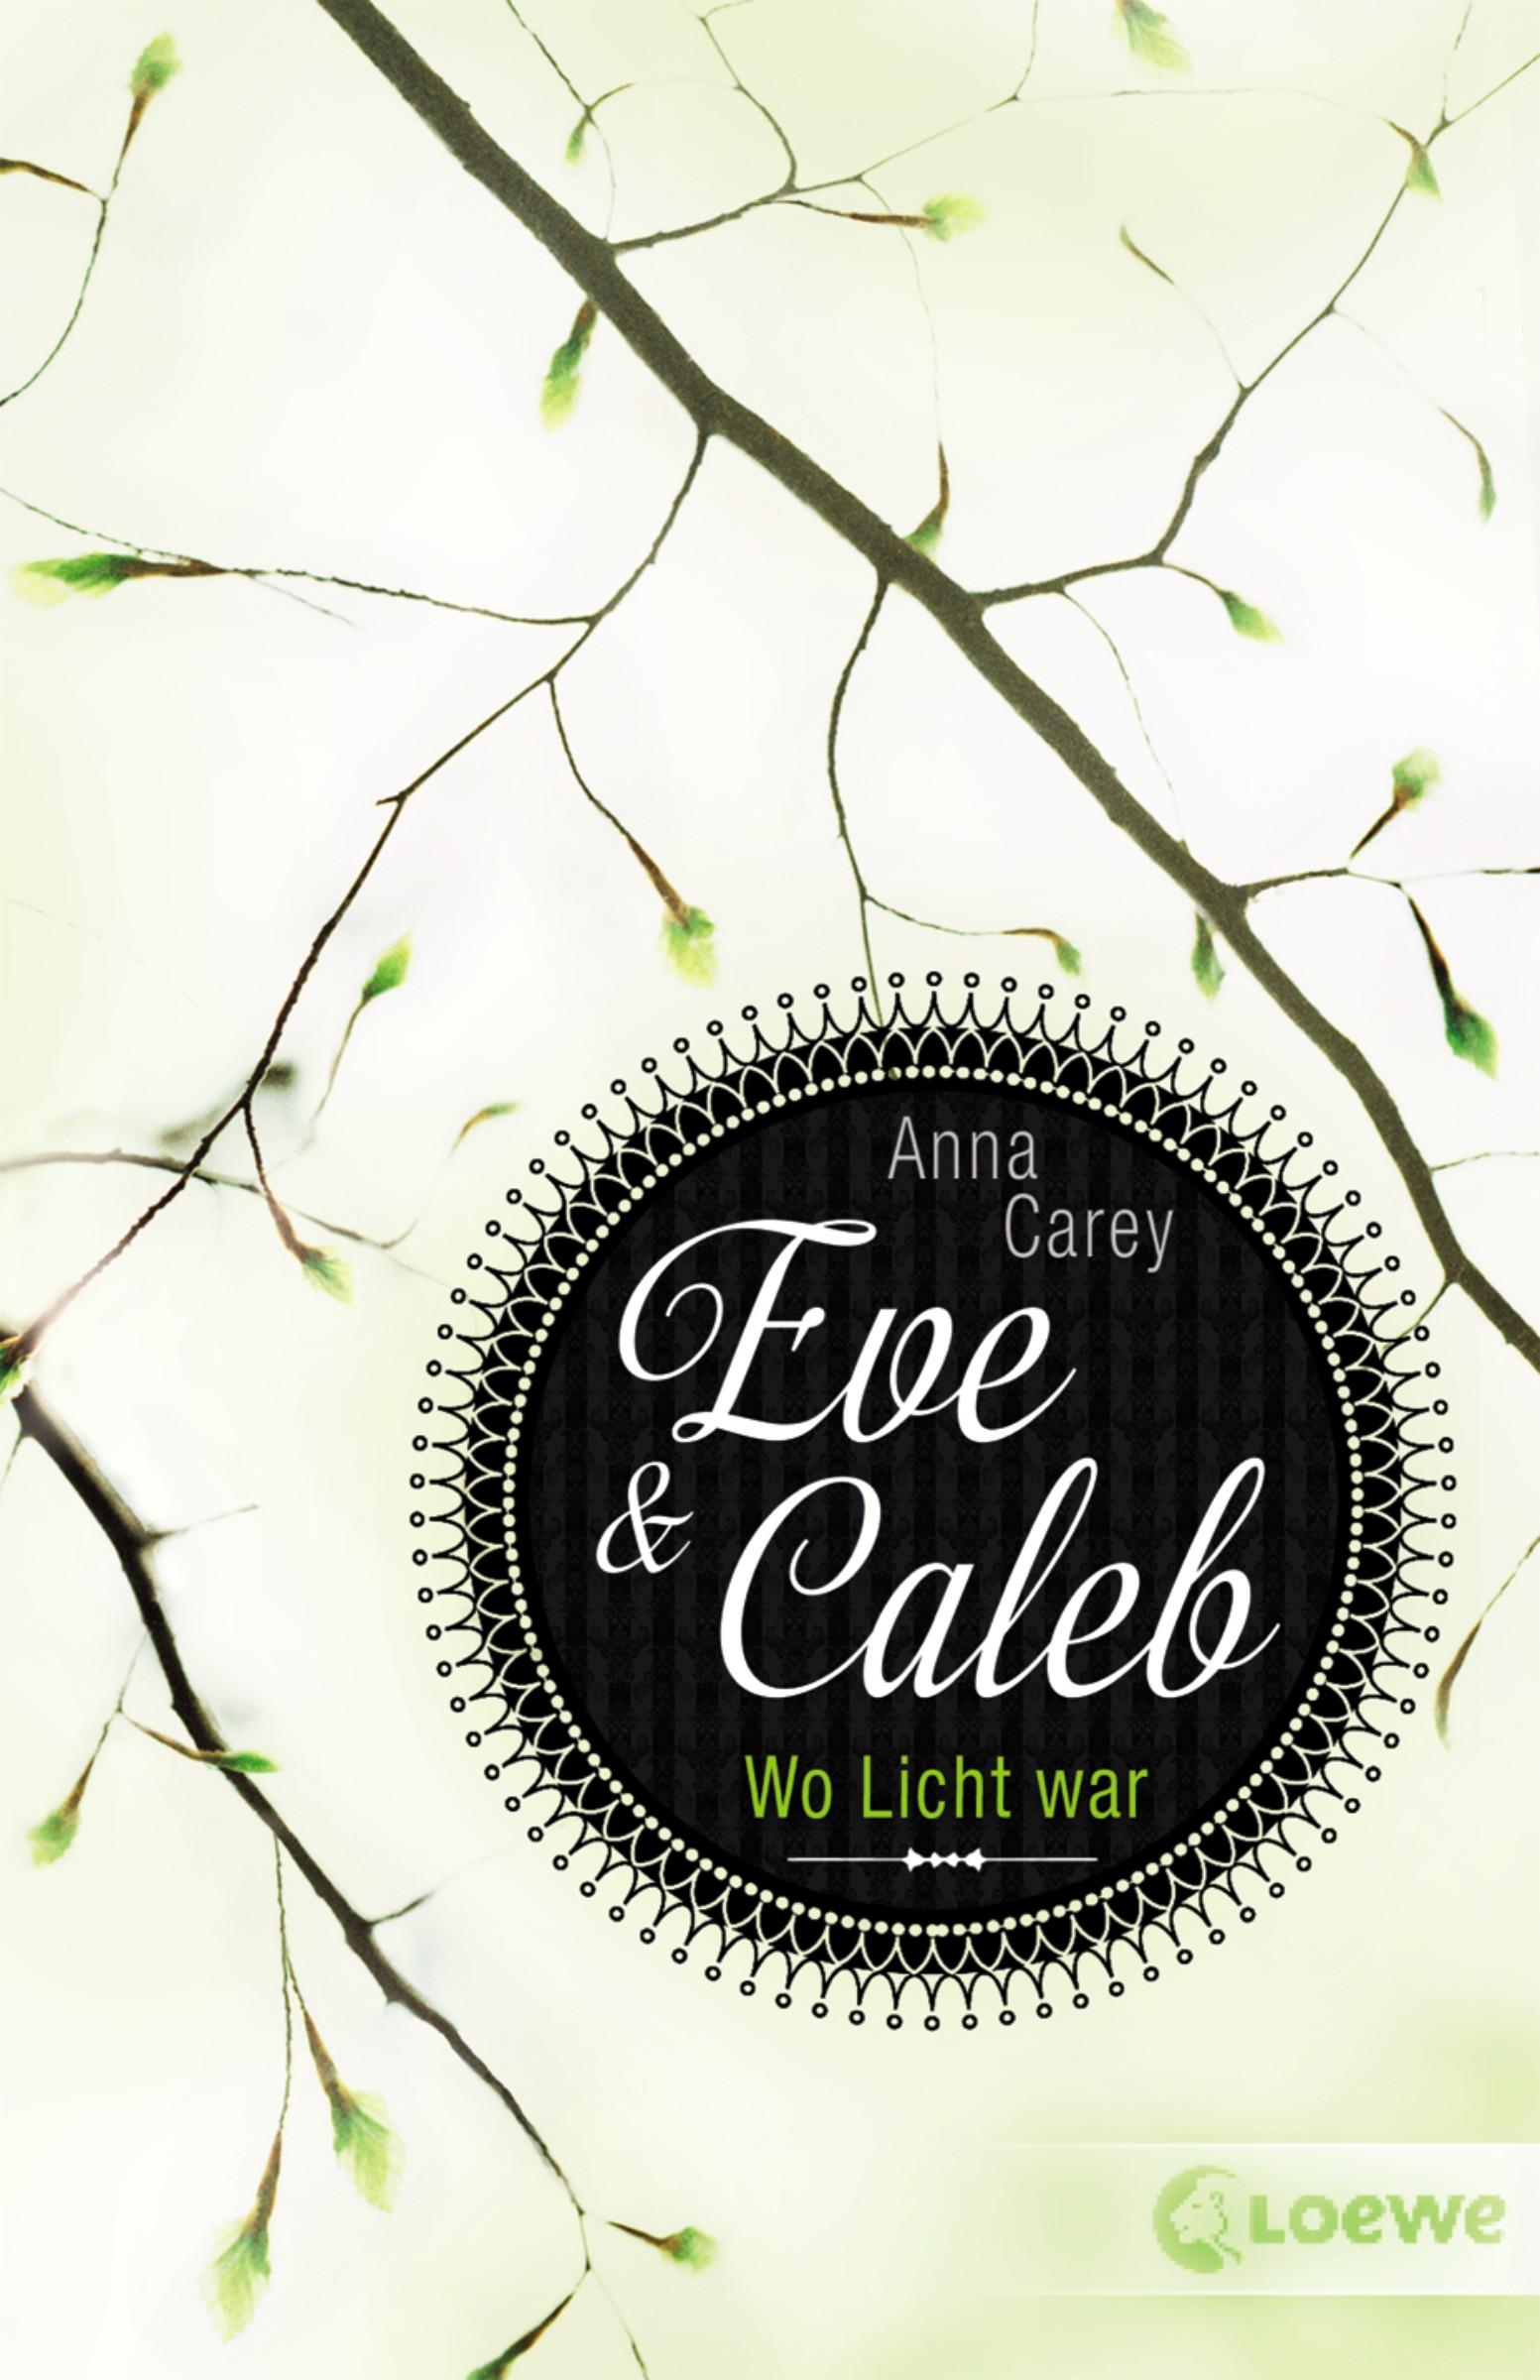 Anna Carey Eve & Caleb 1 - Wo Licht war passion eve set 1